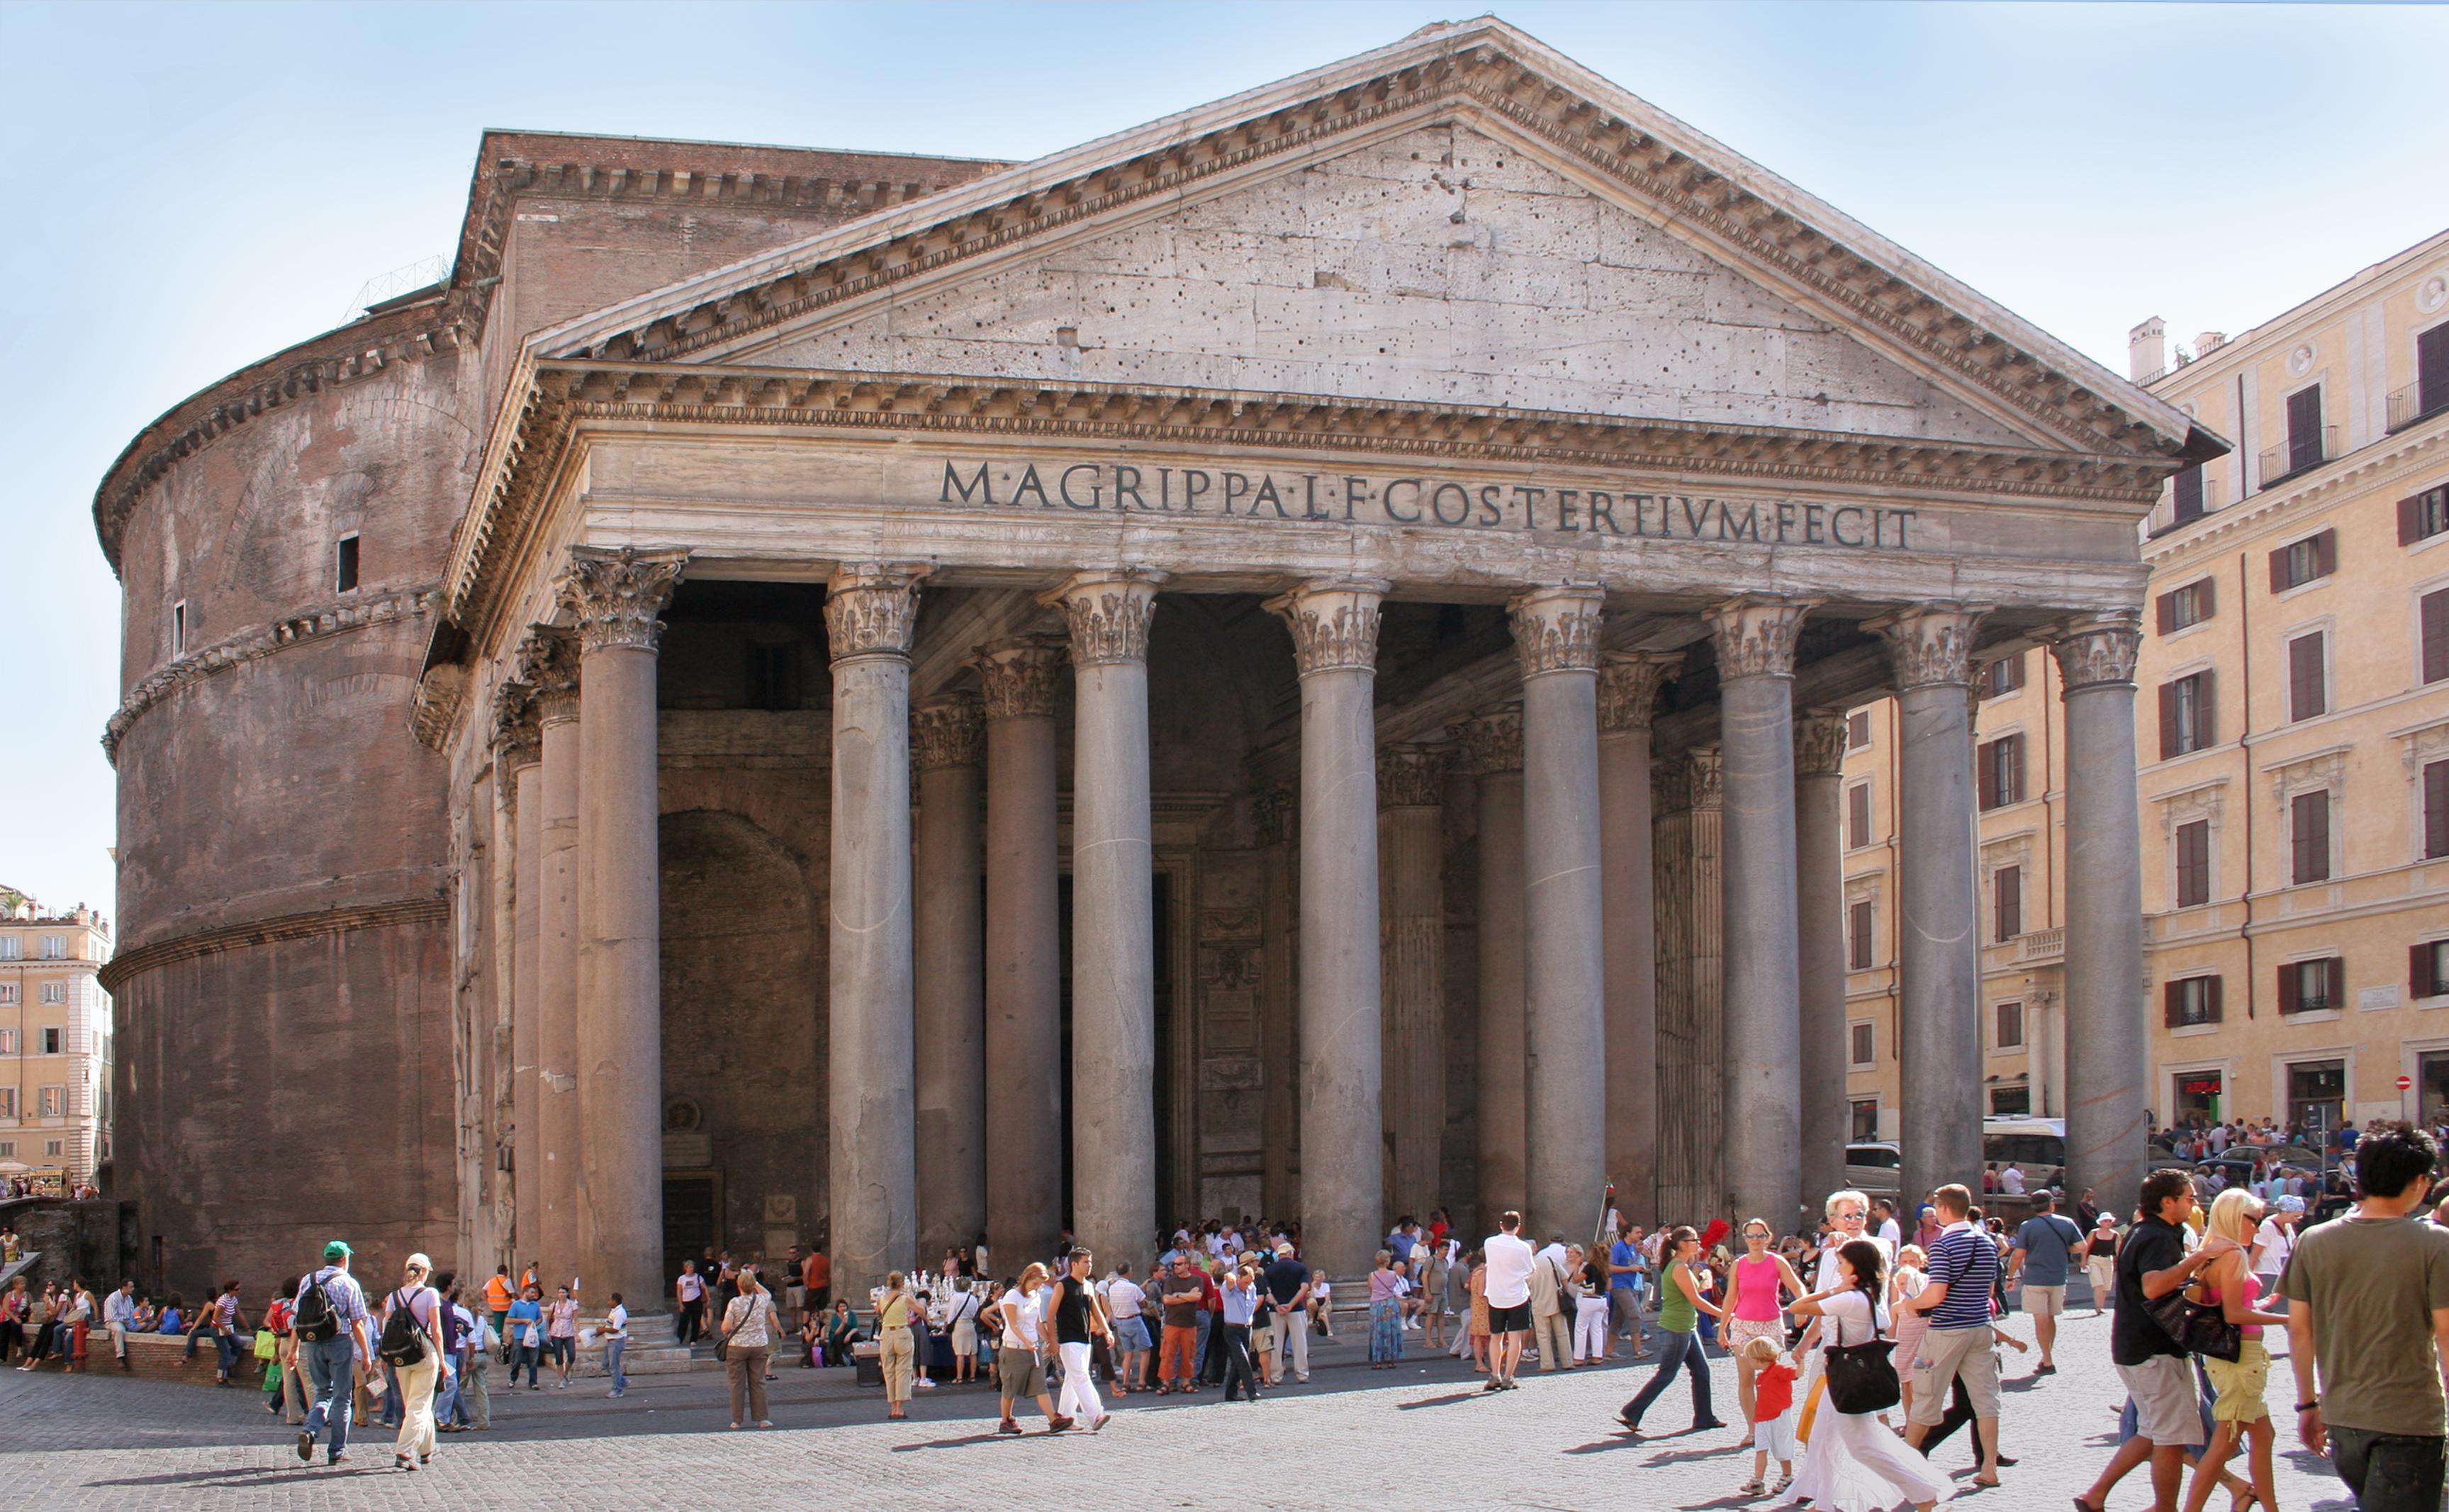 El Panteón, en Roma (Roberta Dragan/Wikimedia Commons)